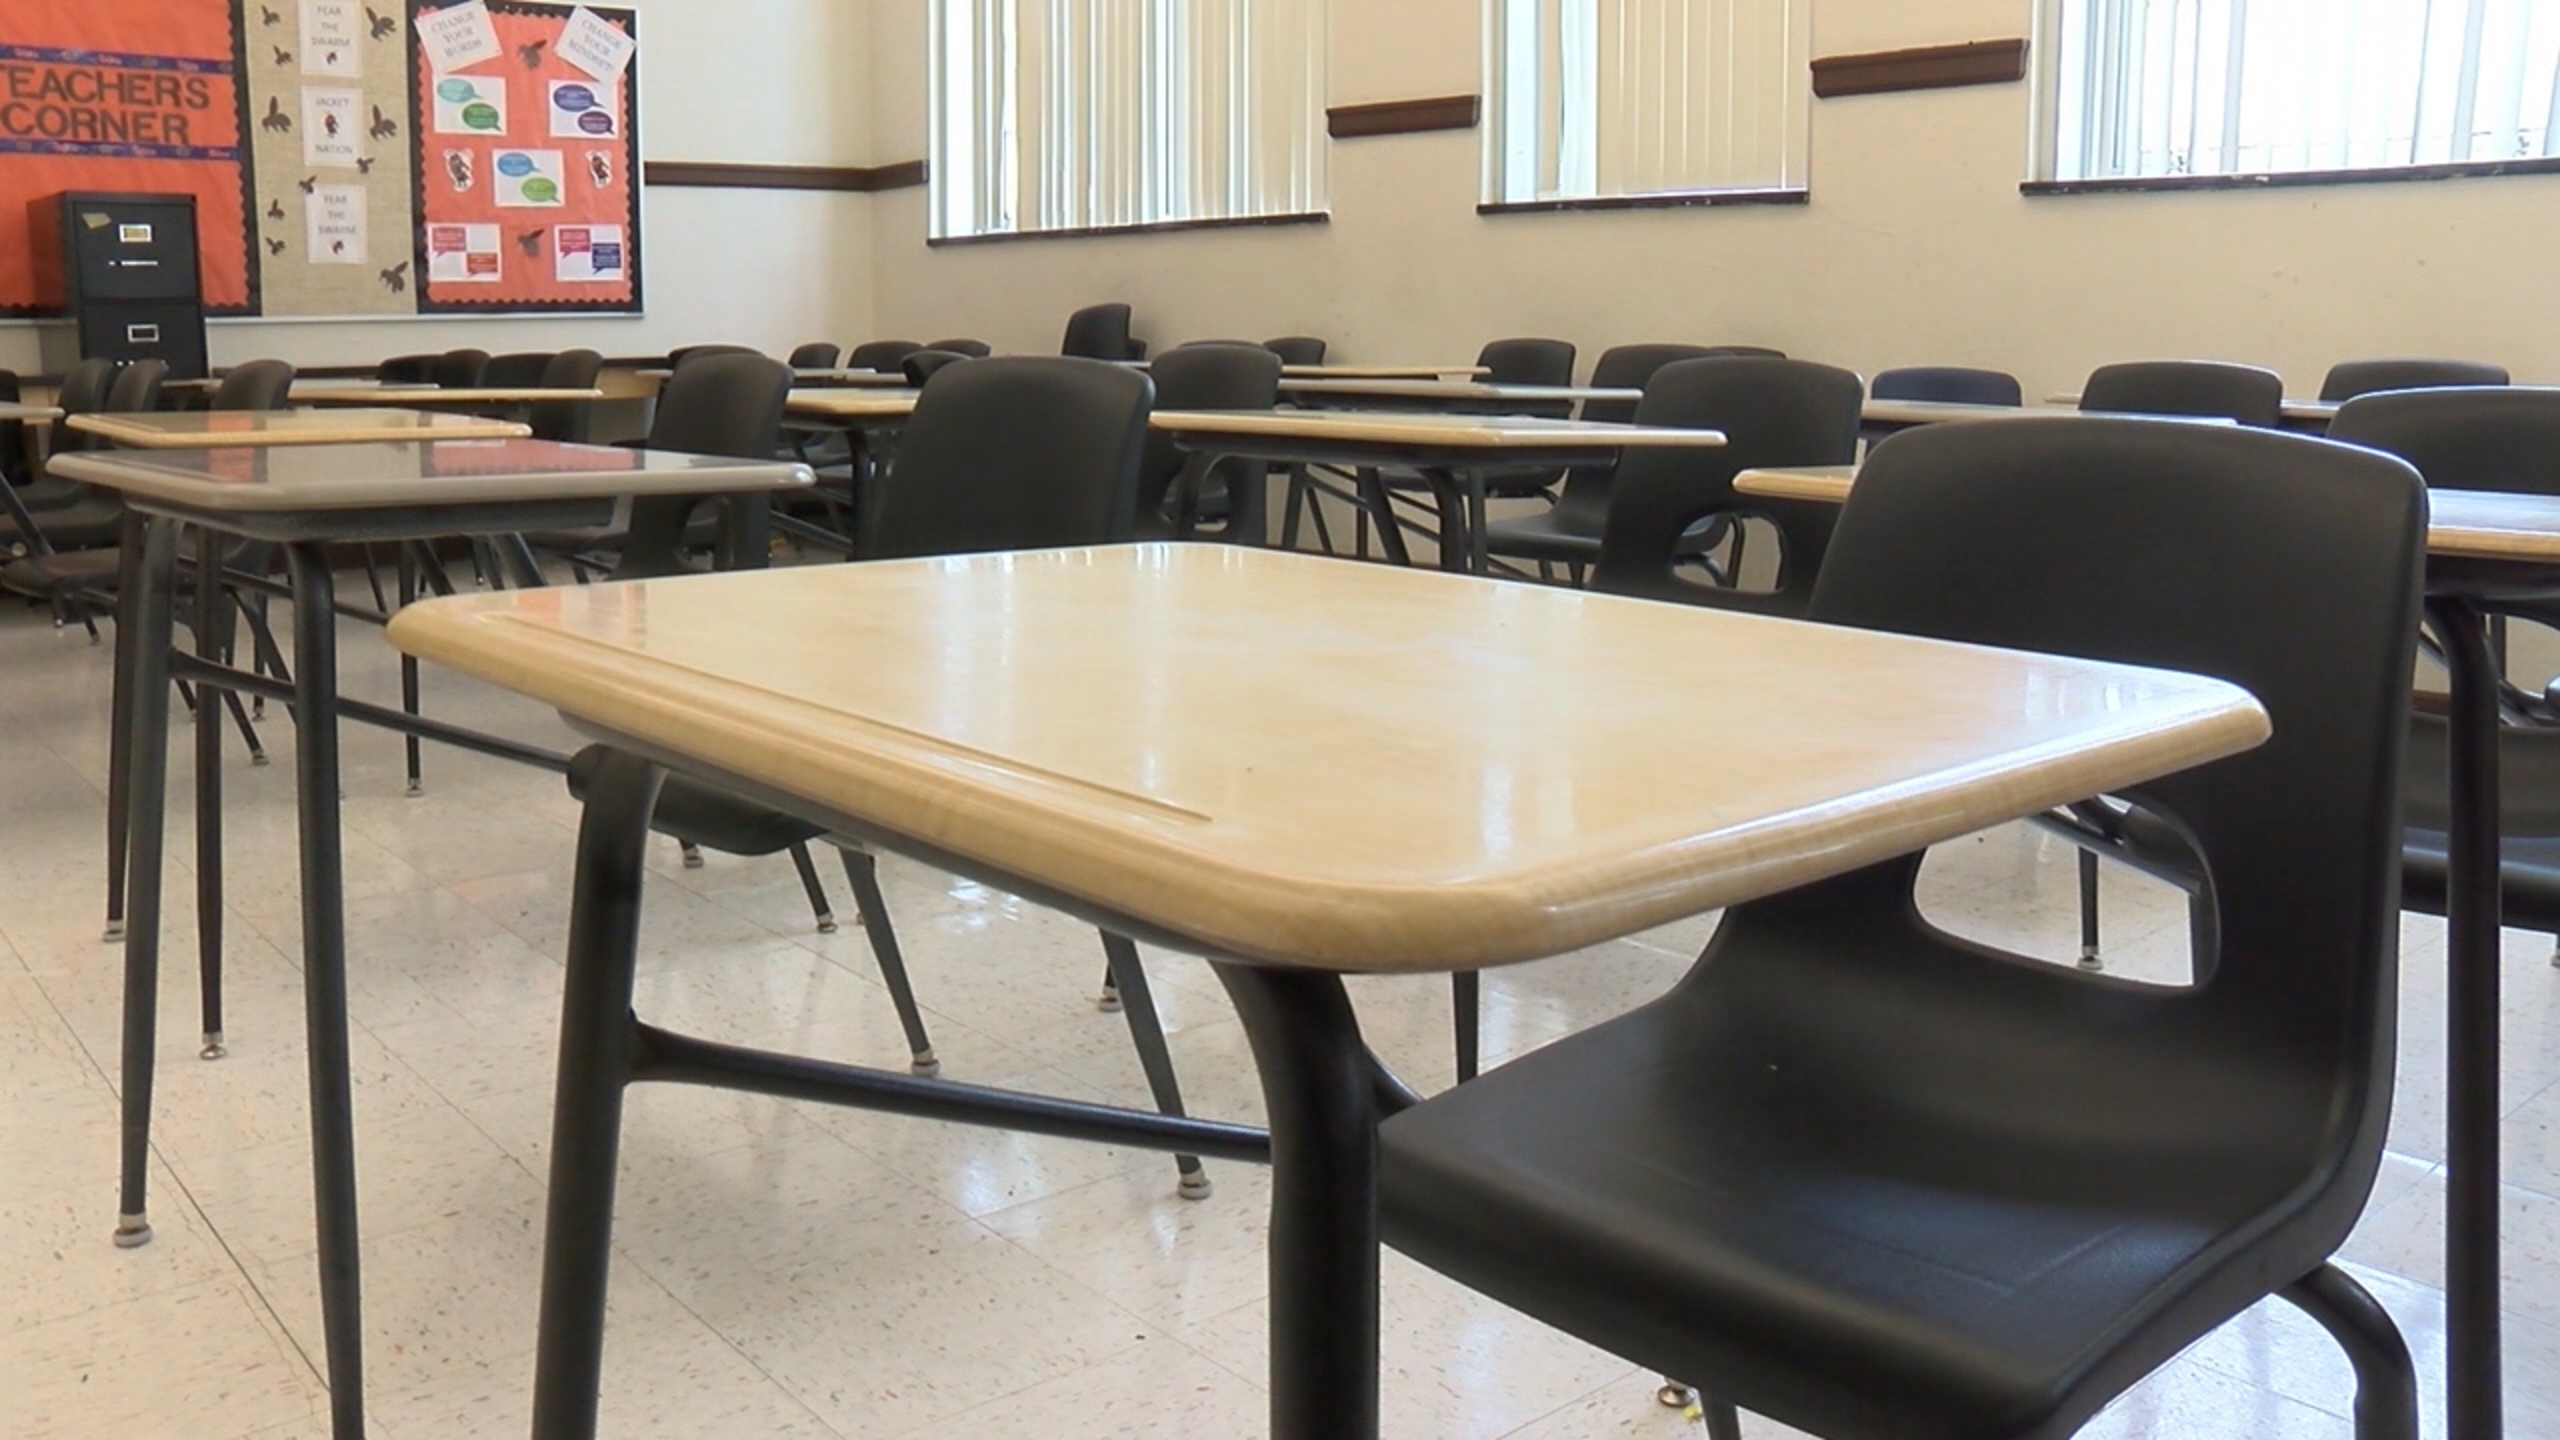 DC Public Schools receives encouraging test results ahead of new school year